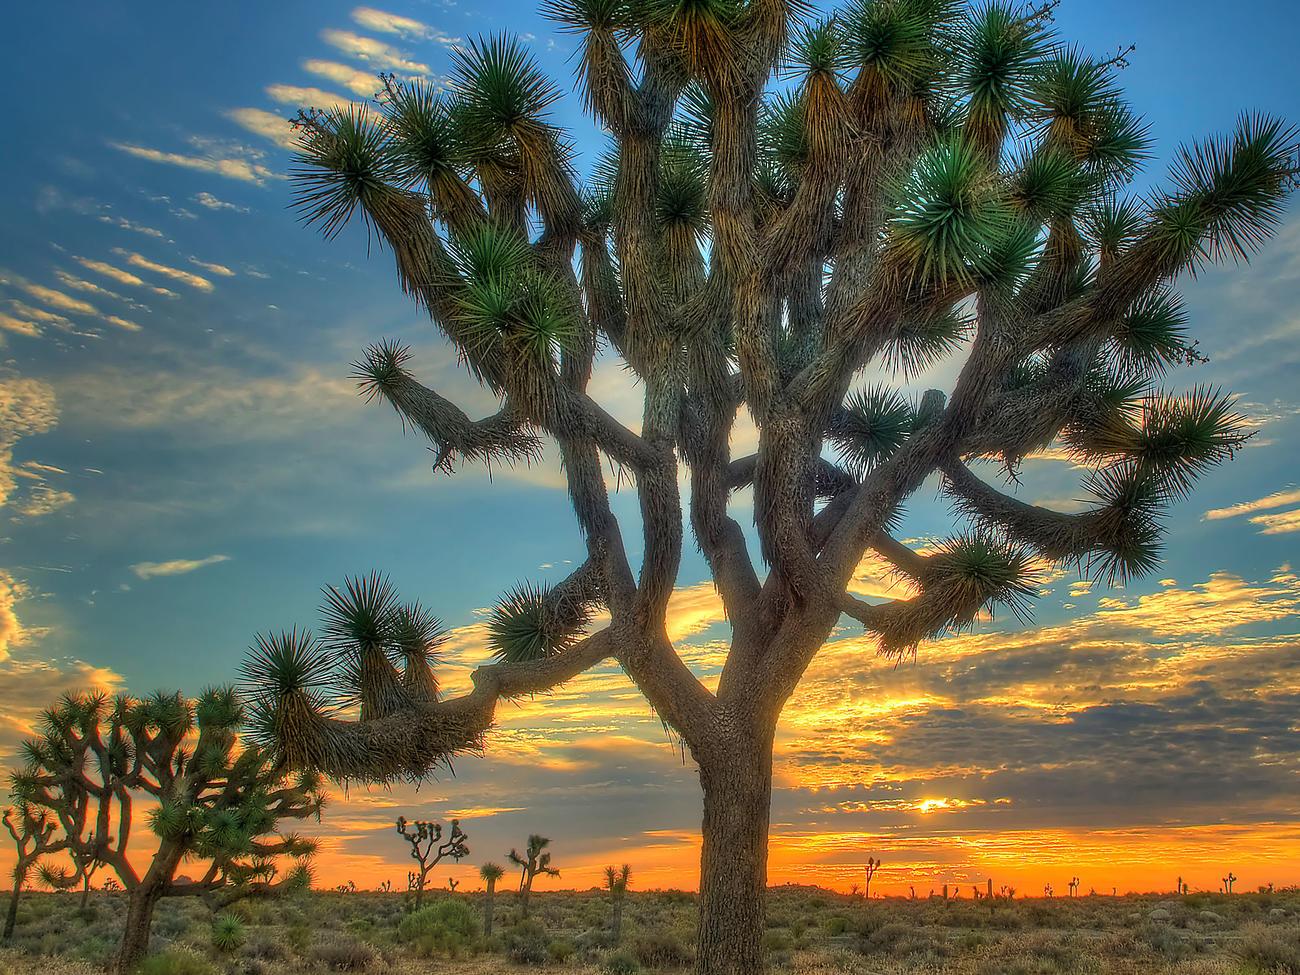 Joshua Tree Guide Sunset Sunset Magazine